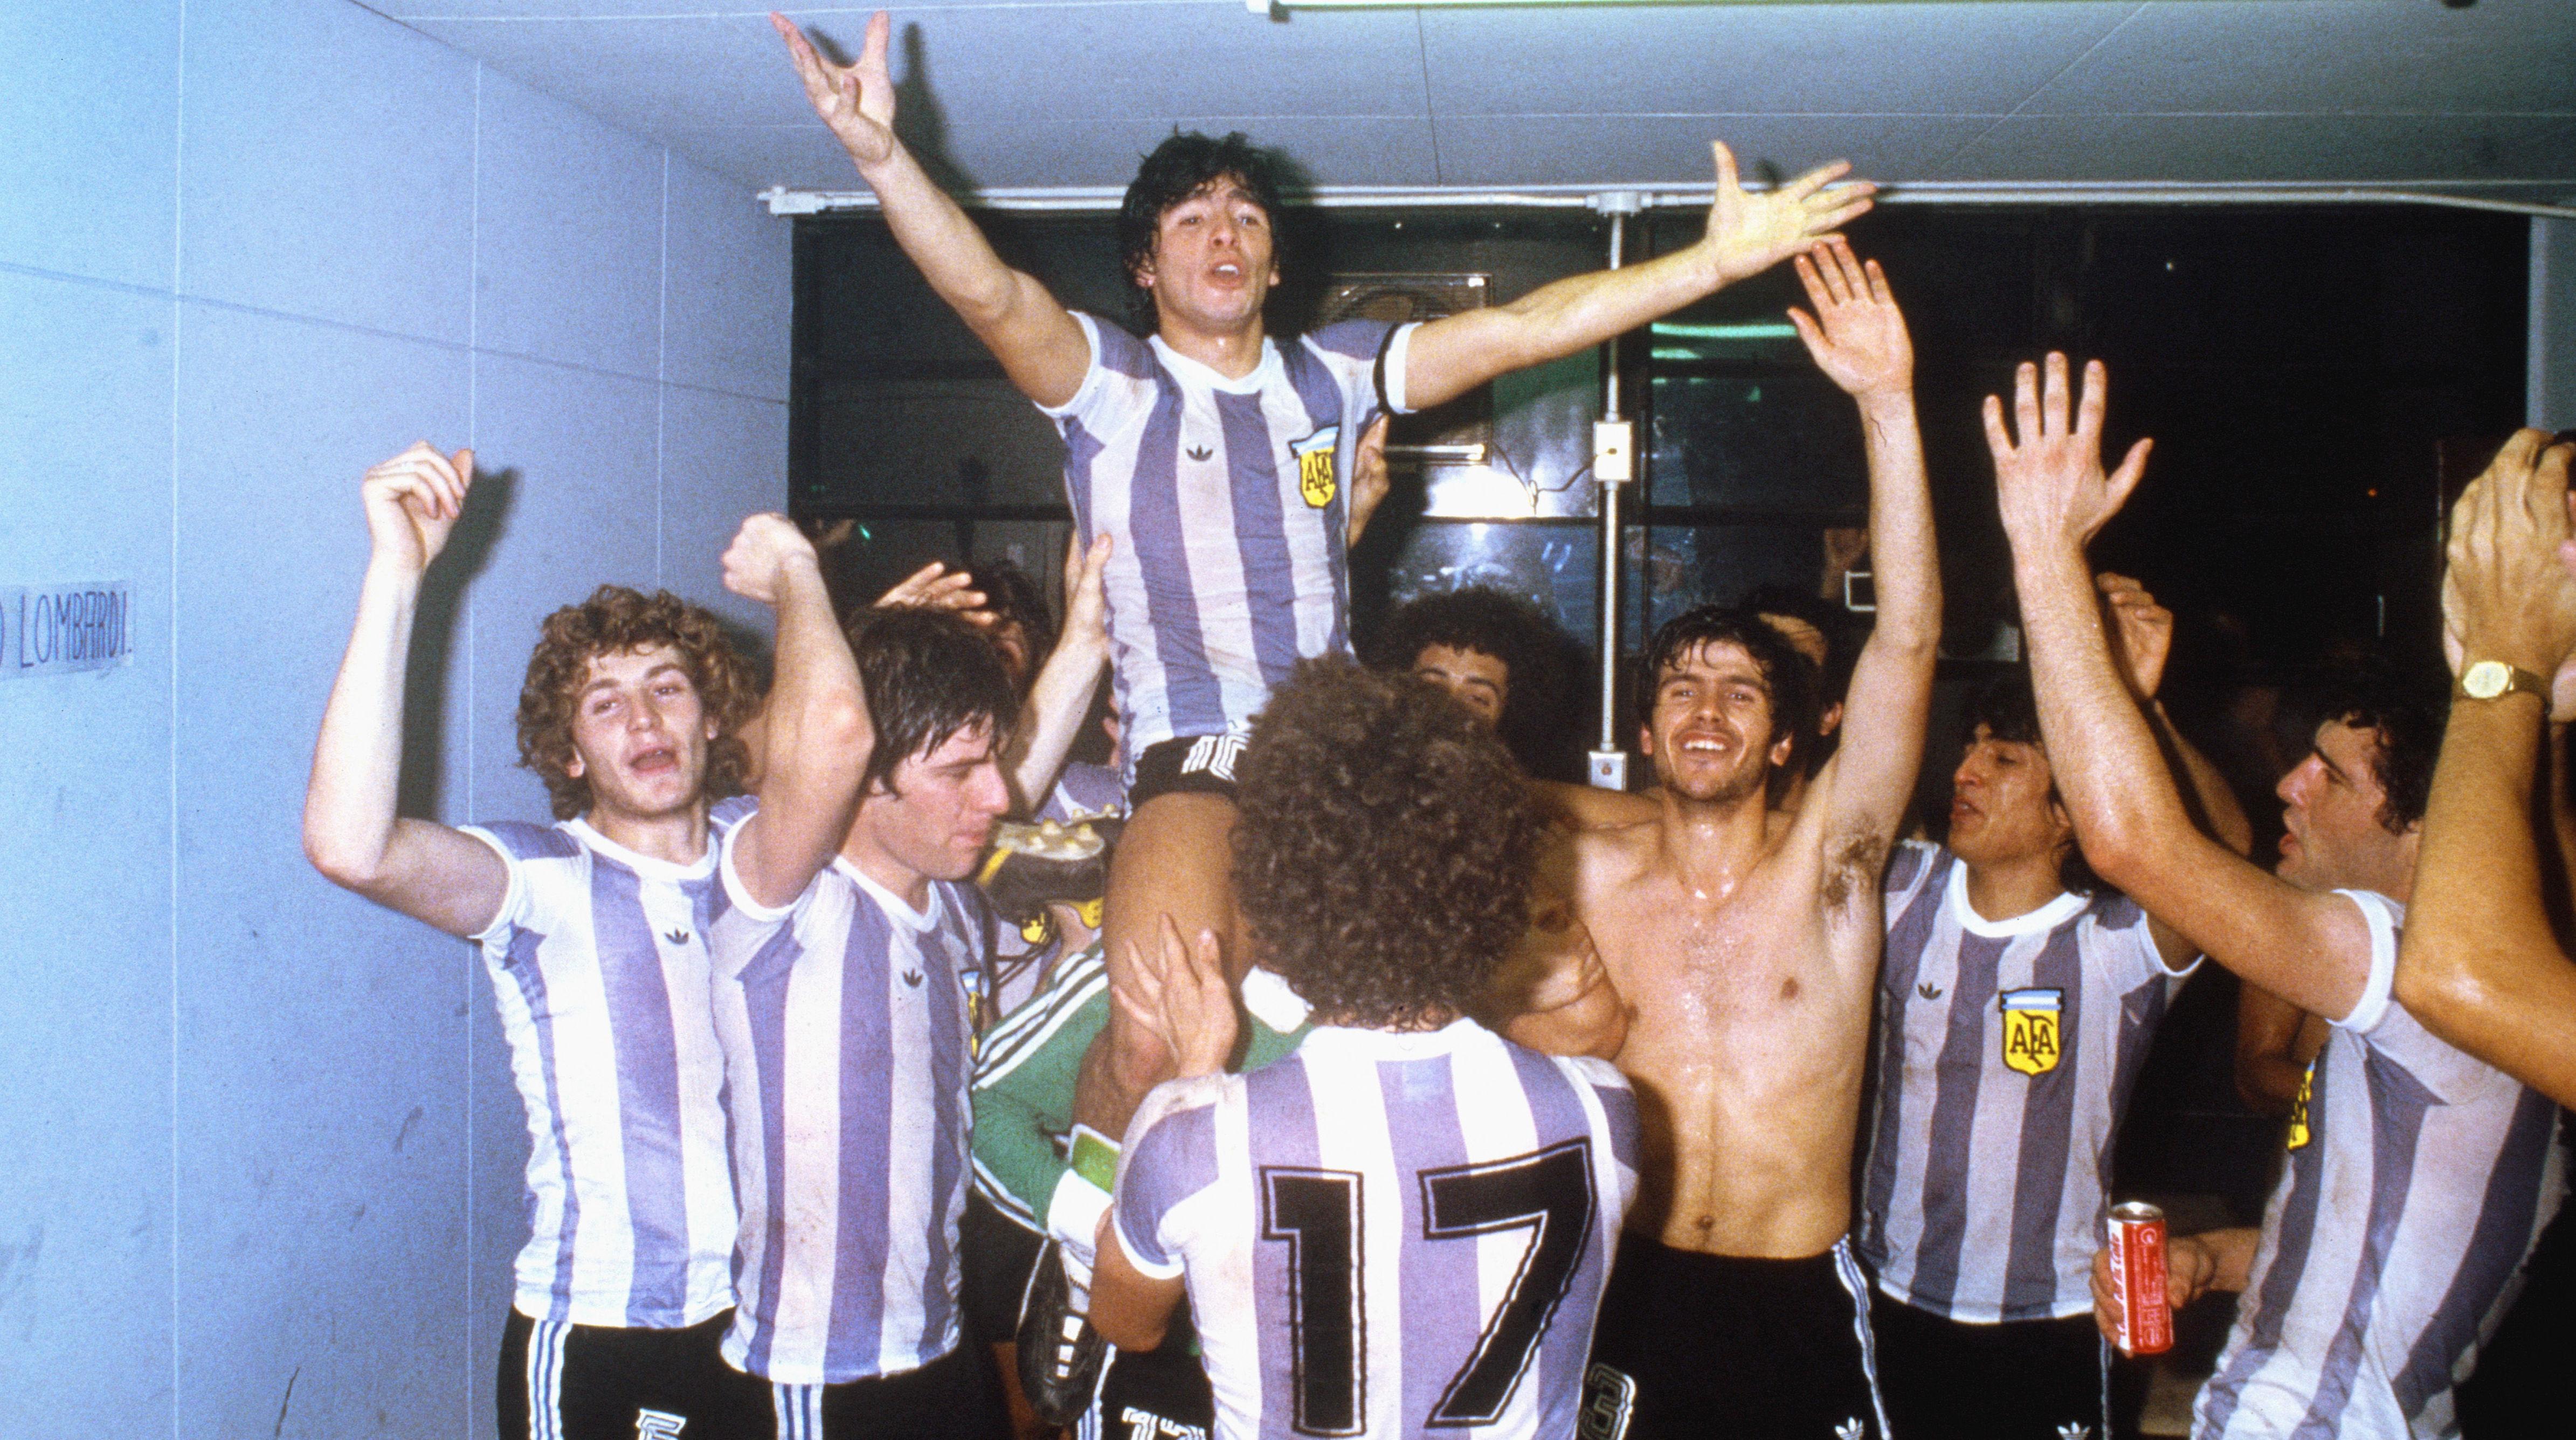 Символ футбола. ФОТО галерея памяти Диего Марадоны - фото 38